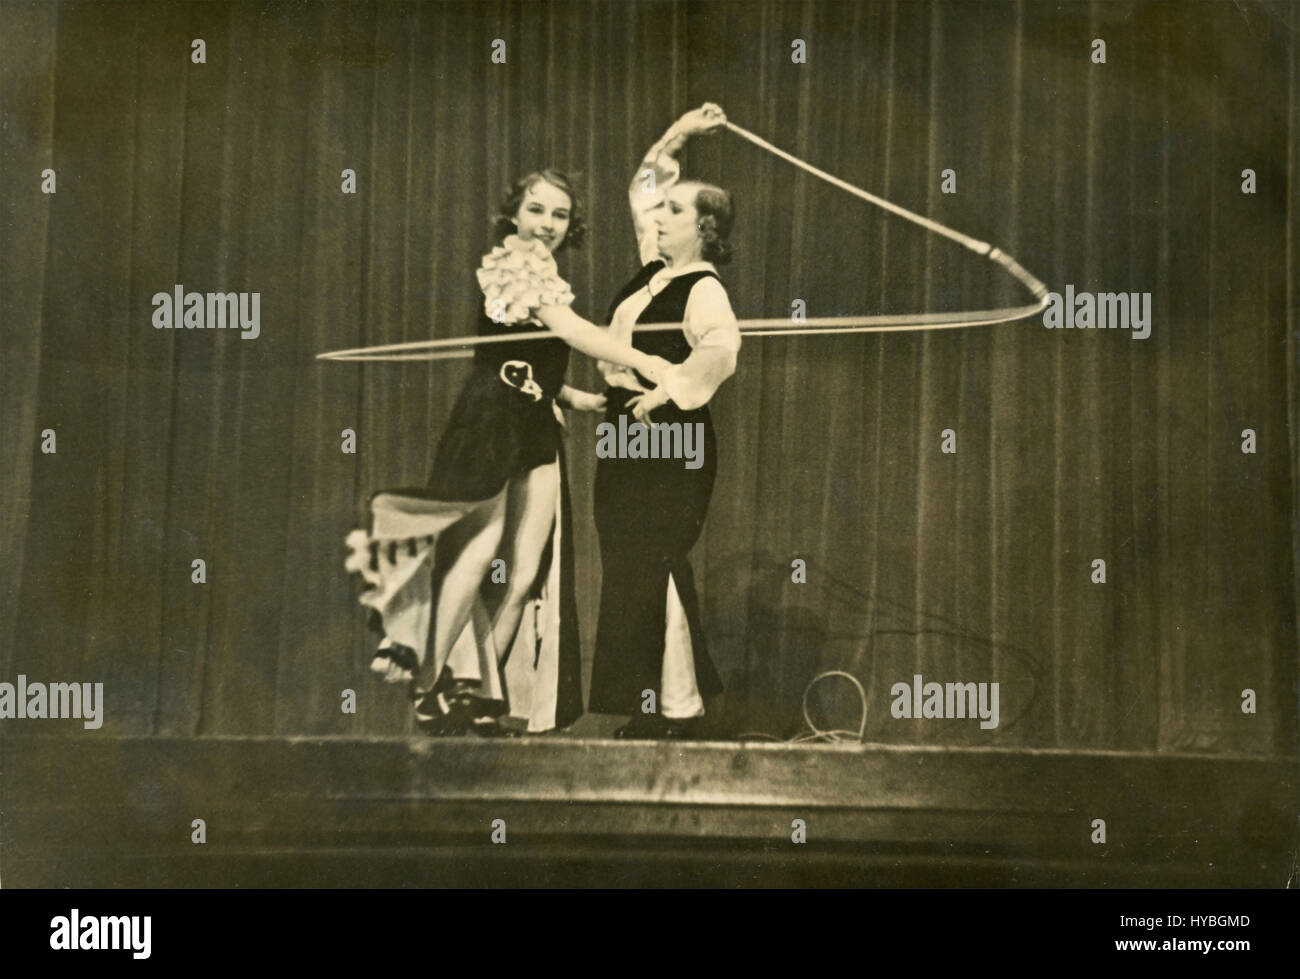 Unidentified women duet show - Stock Image